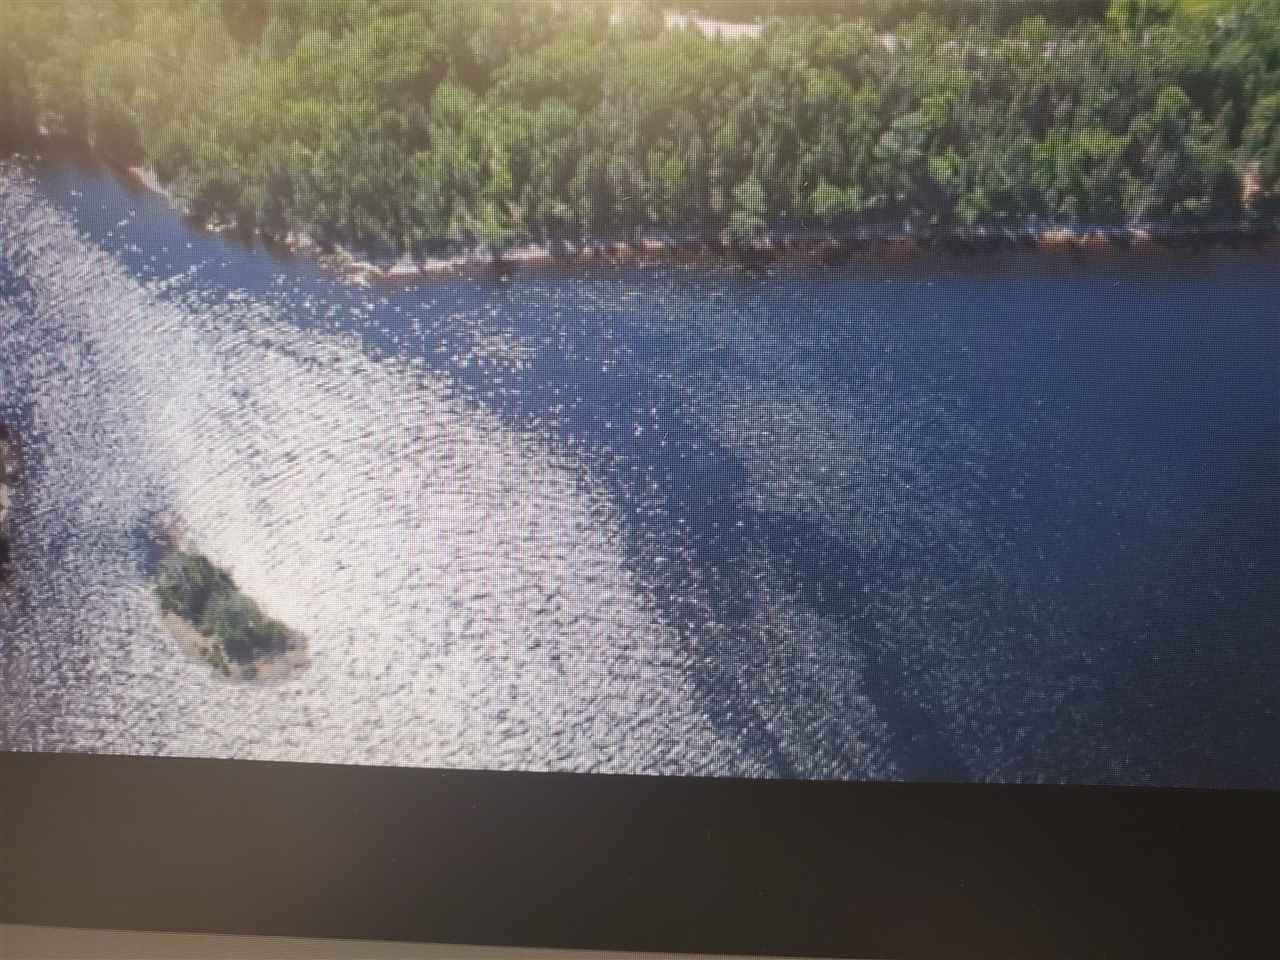 Main Photo: Trout Brook Road in Albert Bridge: 210-Marion Bridge Vacant Land for sale (Cape Breton)  : MLS®# 201919549